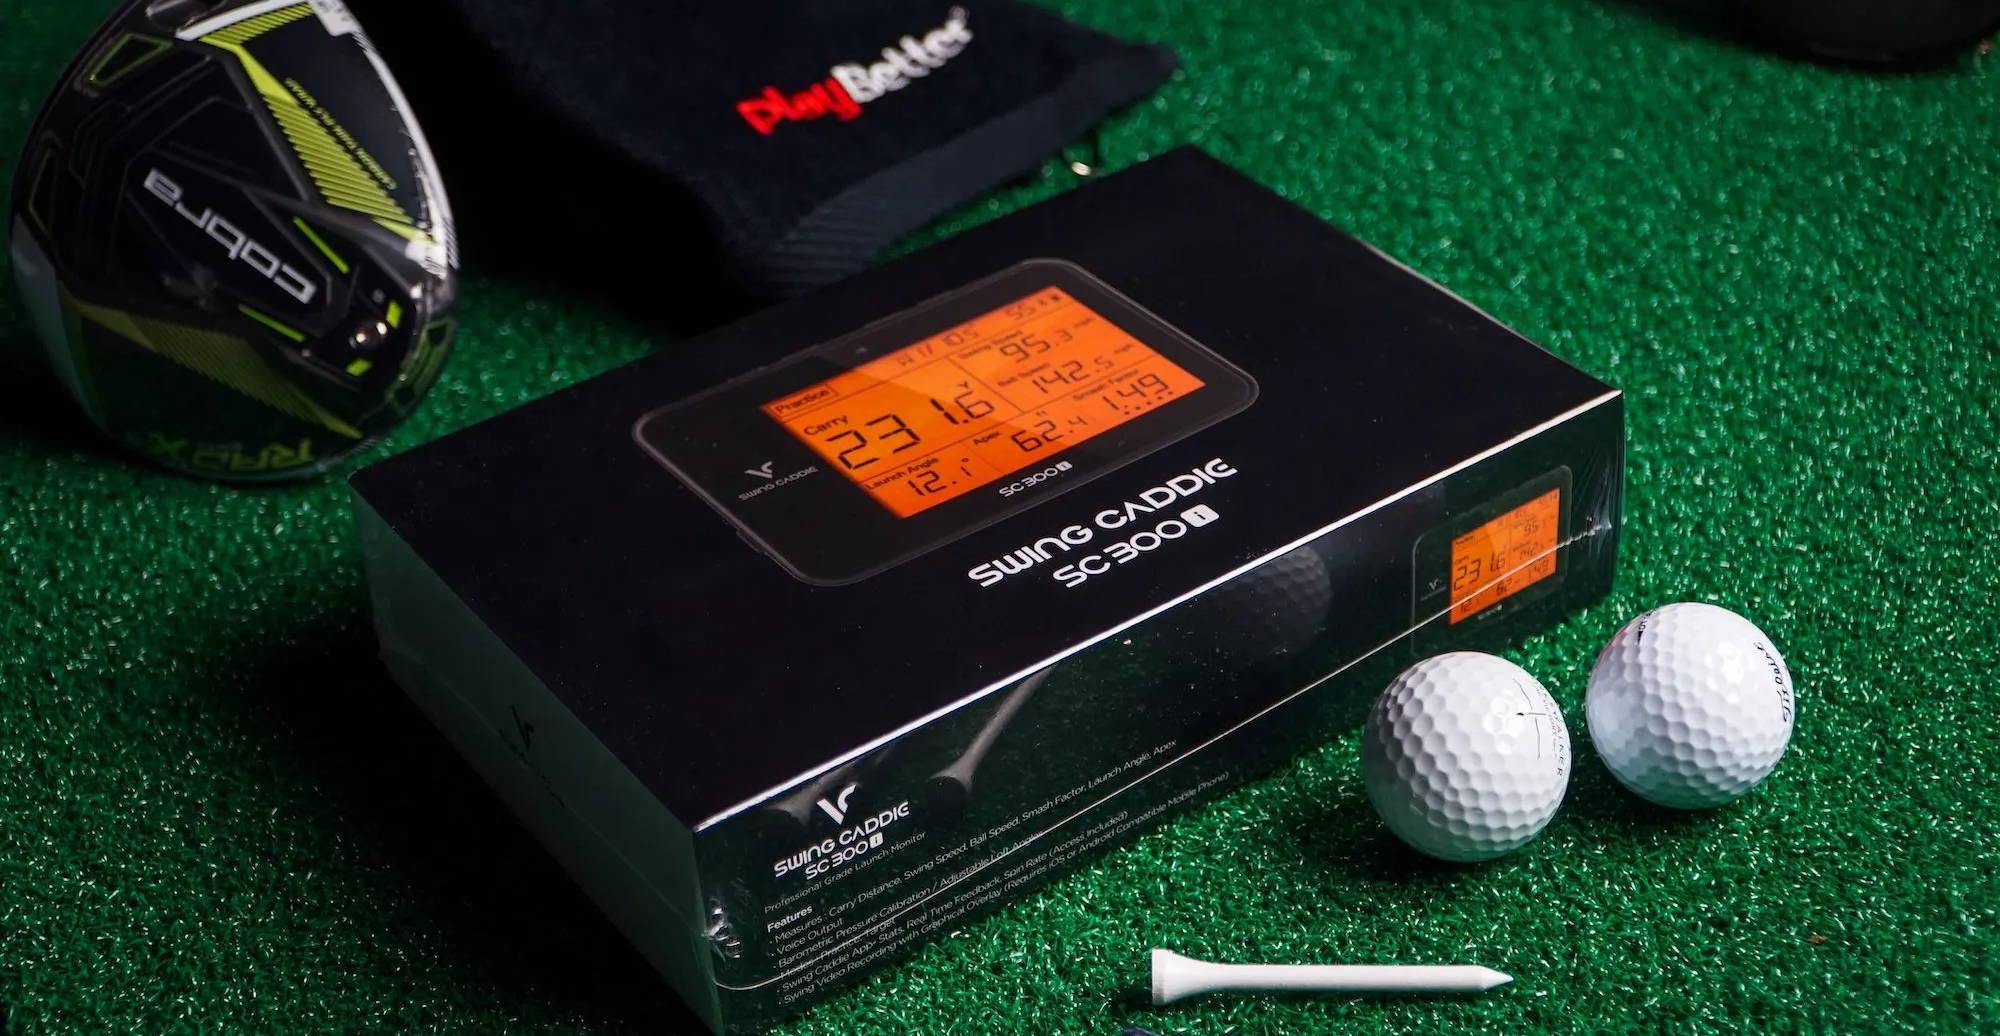 Swing Caddie SC300i golf launch monitor by Voice Caddie